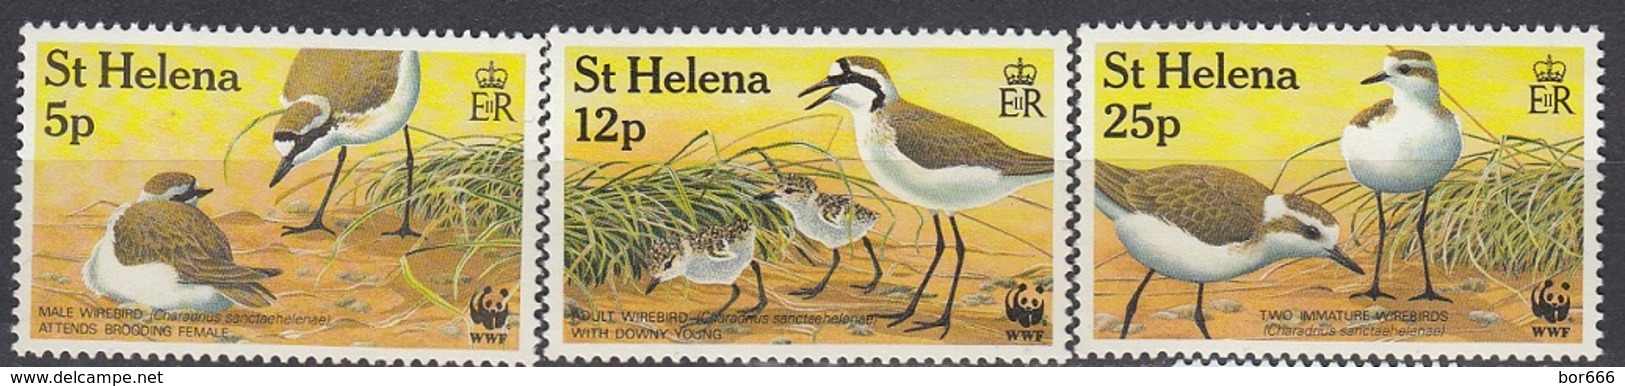 St Helena - WWF / BIRDS 1993 MNH - Saint Helena Island